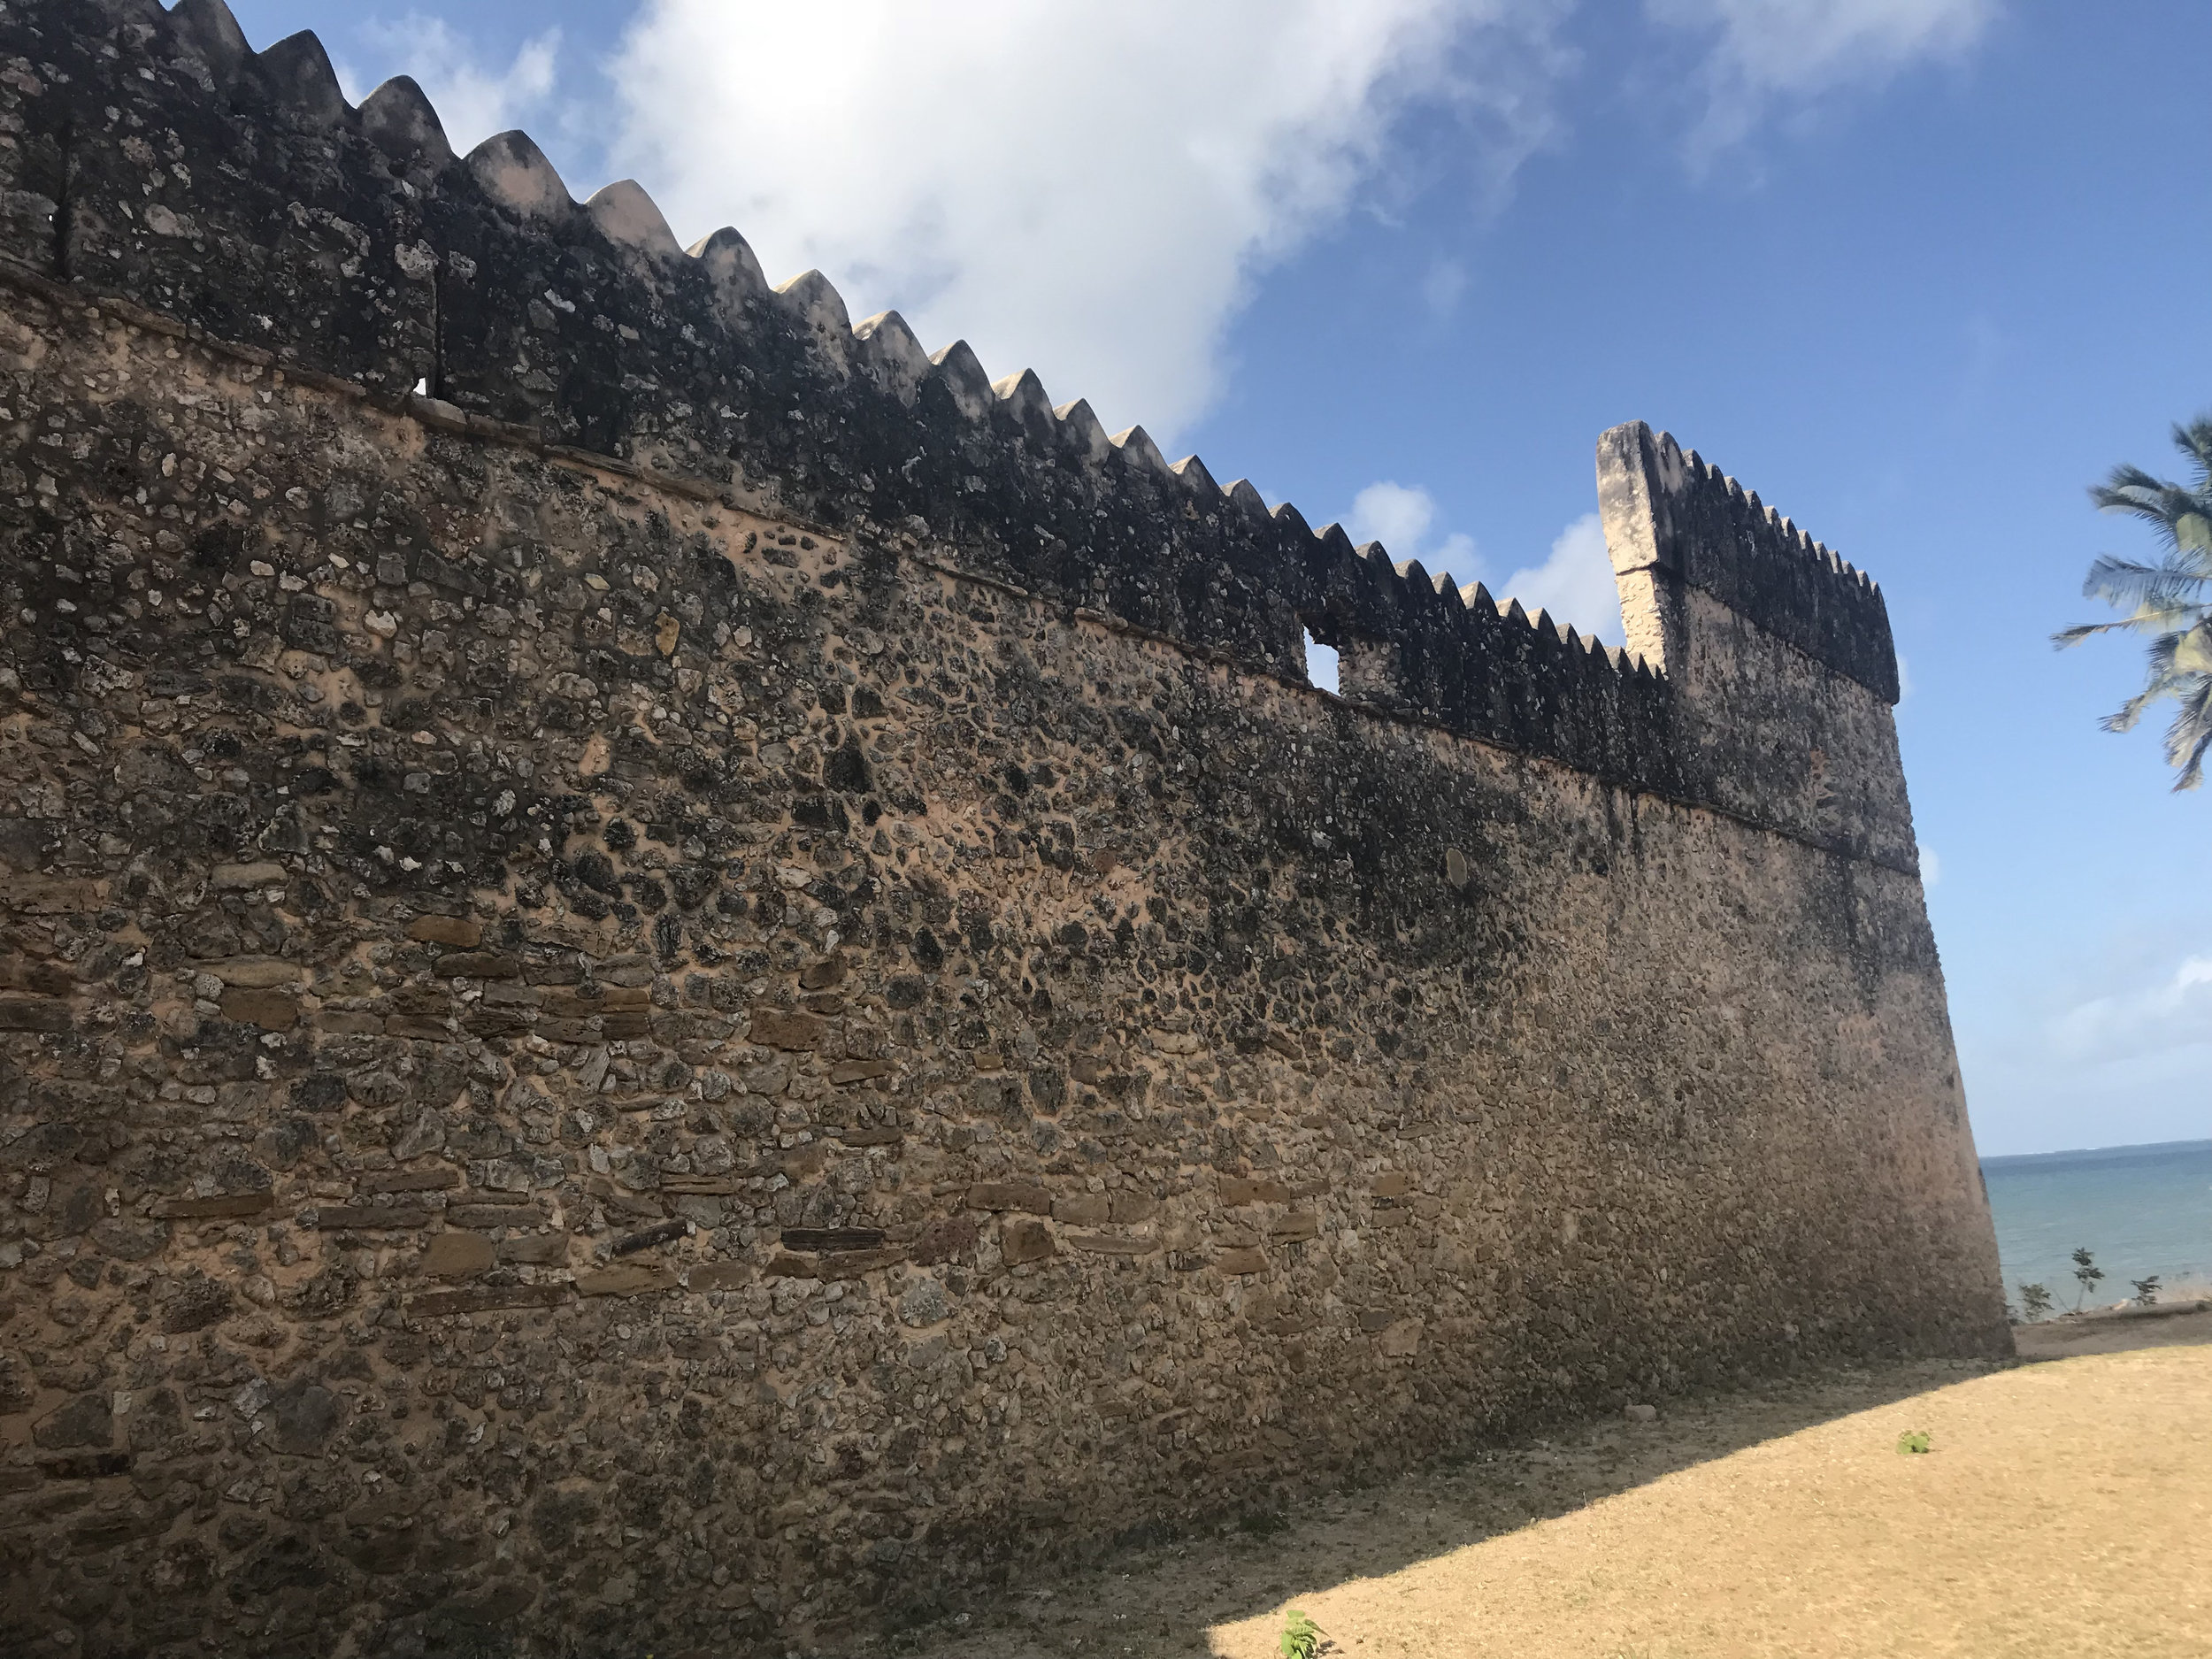 The World Heritage site of Kilwa Kisiwani, Tanzania, and the modern community living within it.